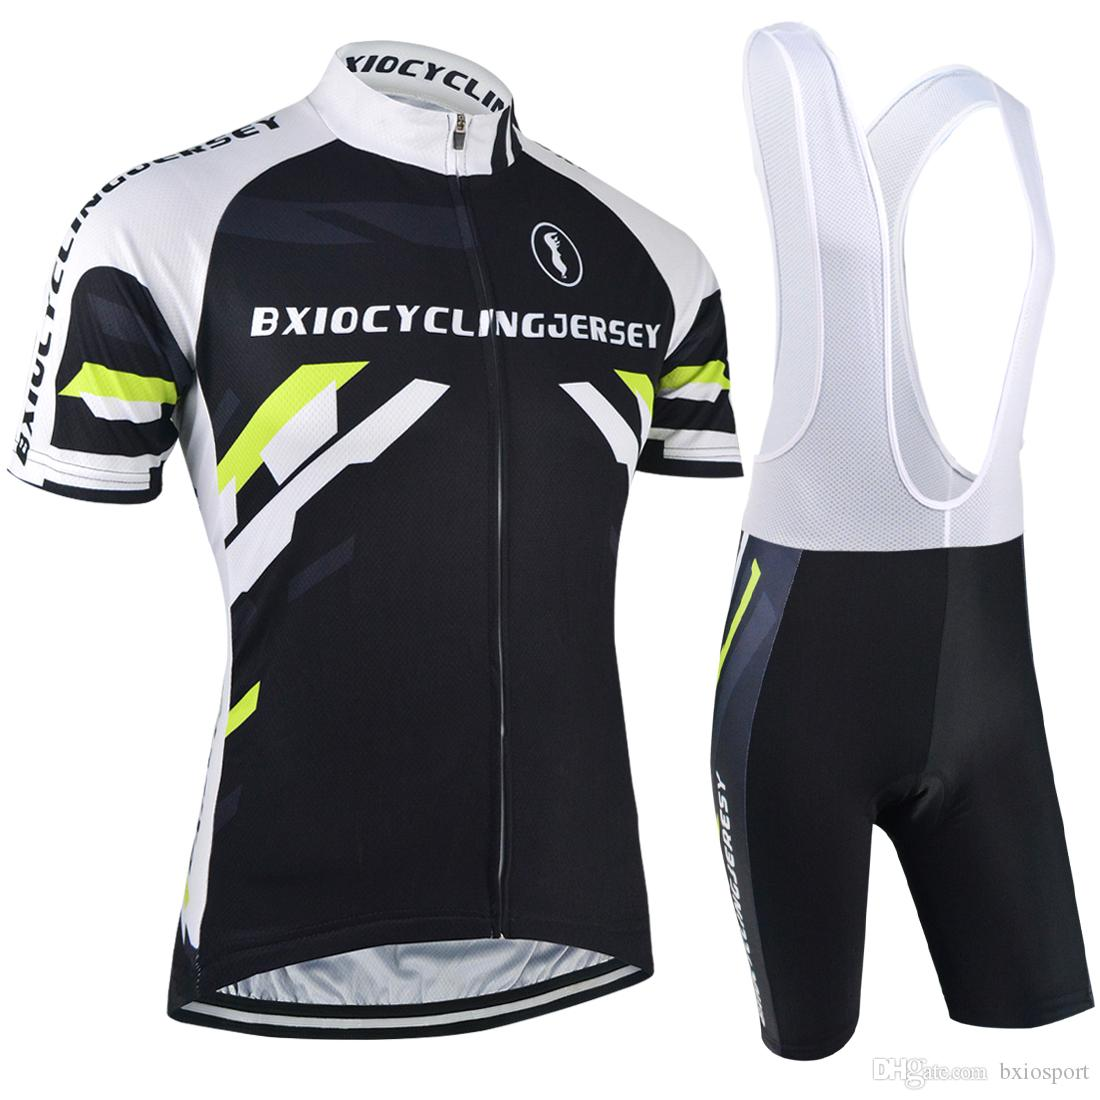 BXIO Brand Black Lycra Bike Clothing Sets Cool Mountain Cycling ... e816a6d51